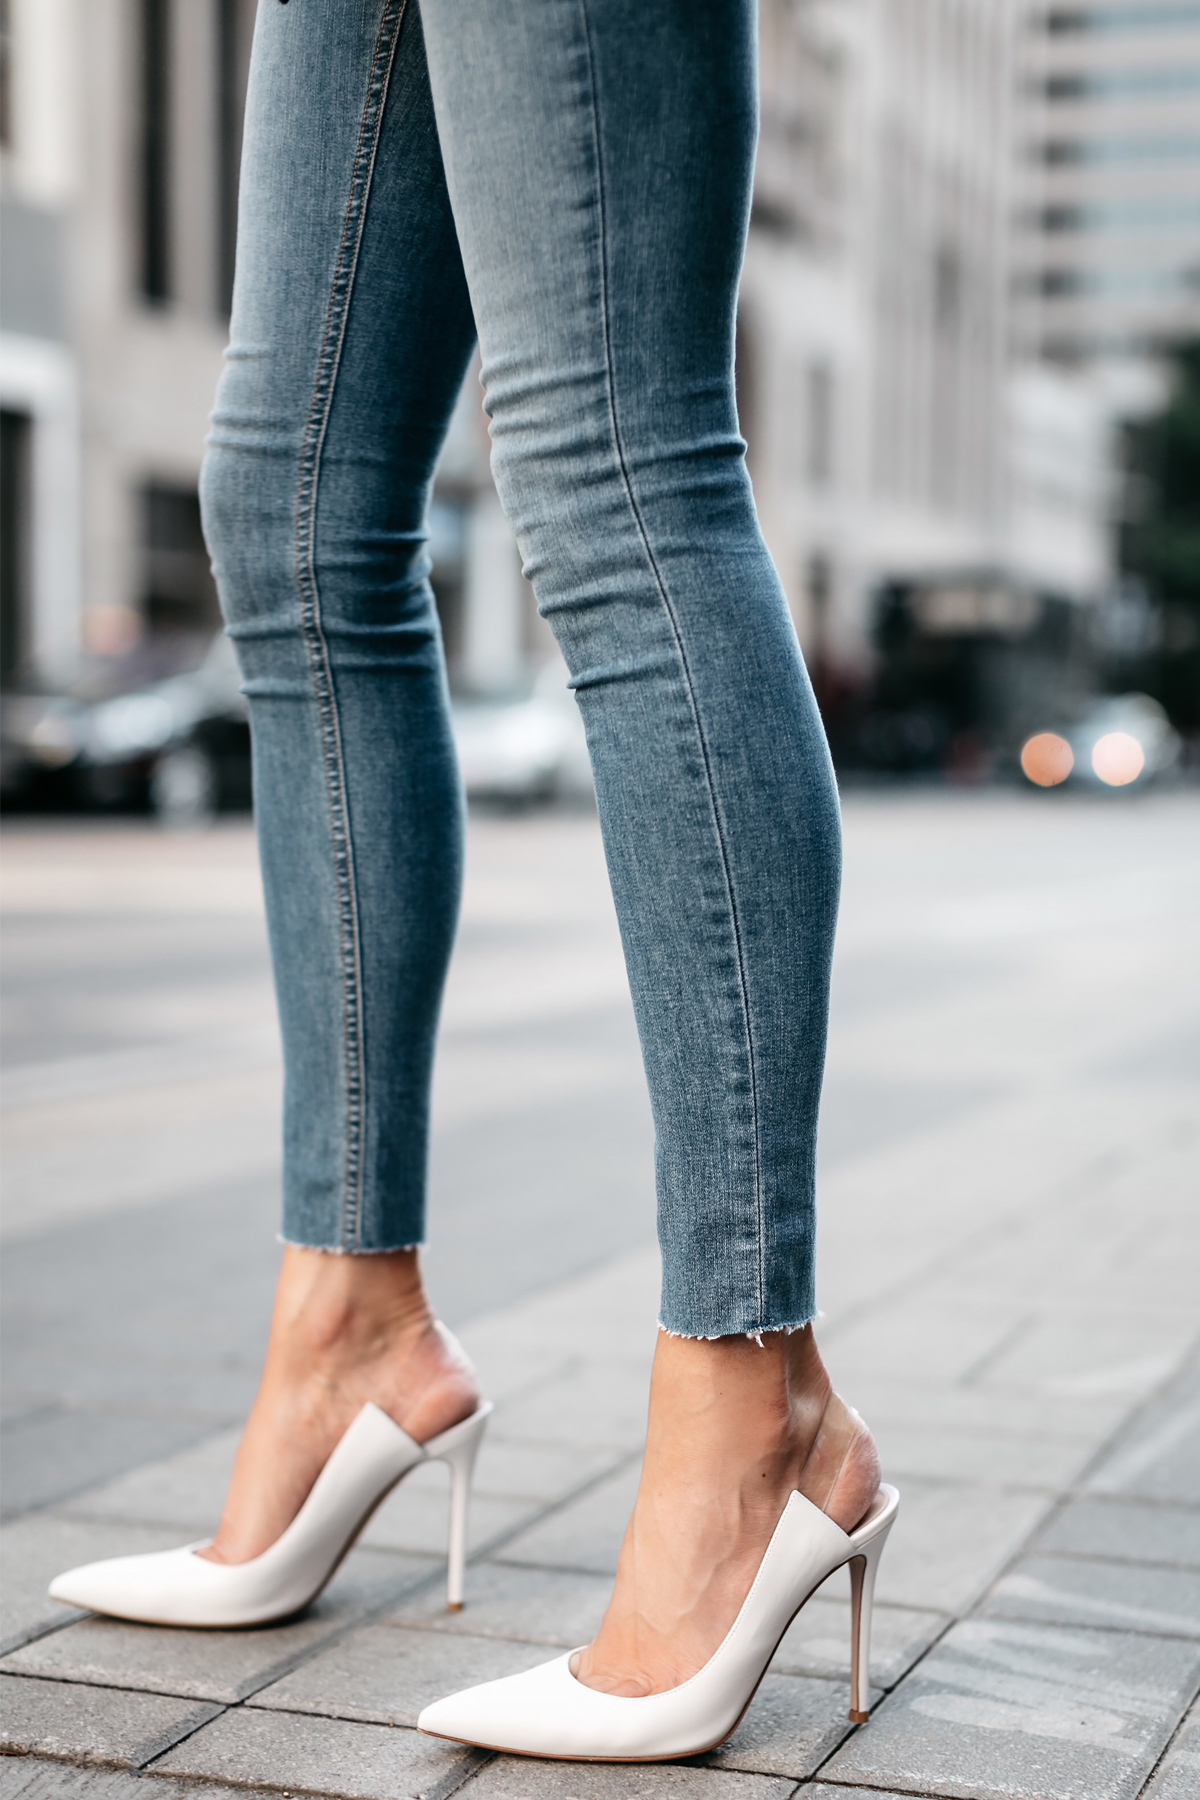 Woman Wearing rag and bone Denim Skinny Jeans Gianvito Rossi White Slingback Pumps Fashion Jackson Dallas Blogger Fashion Blogger Street Style